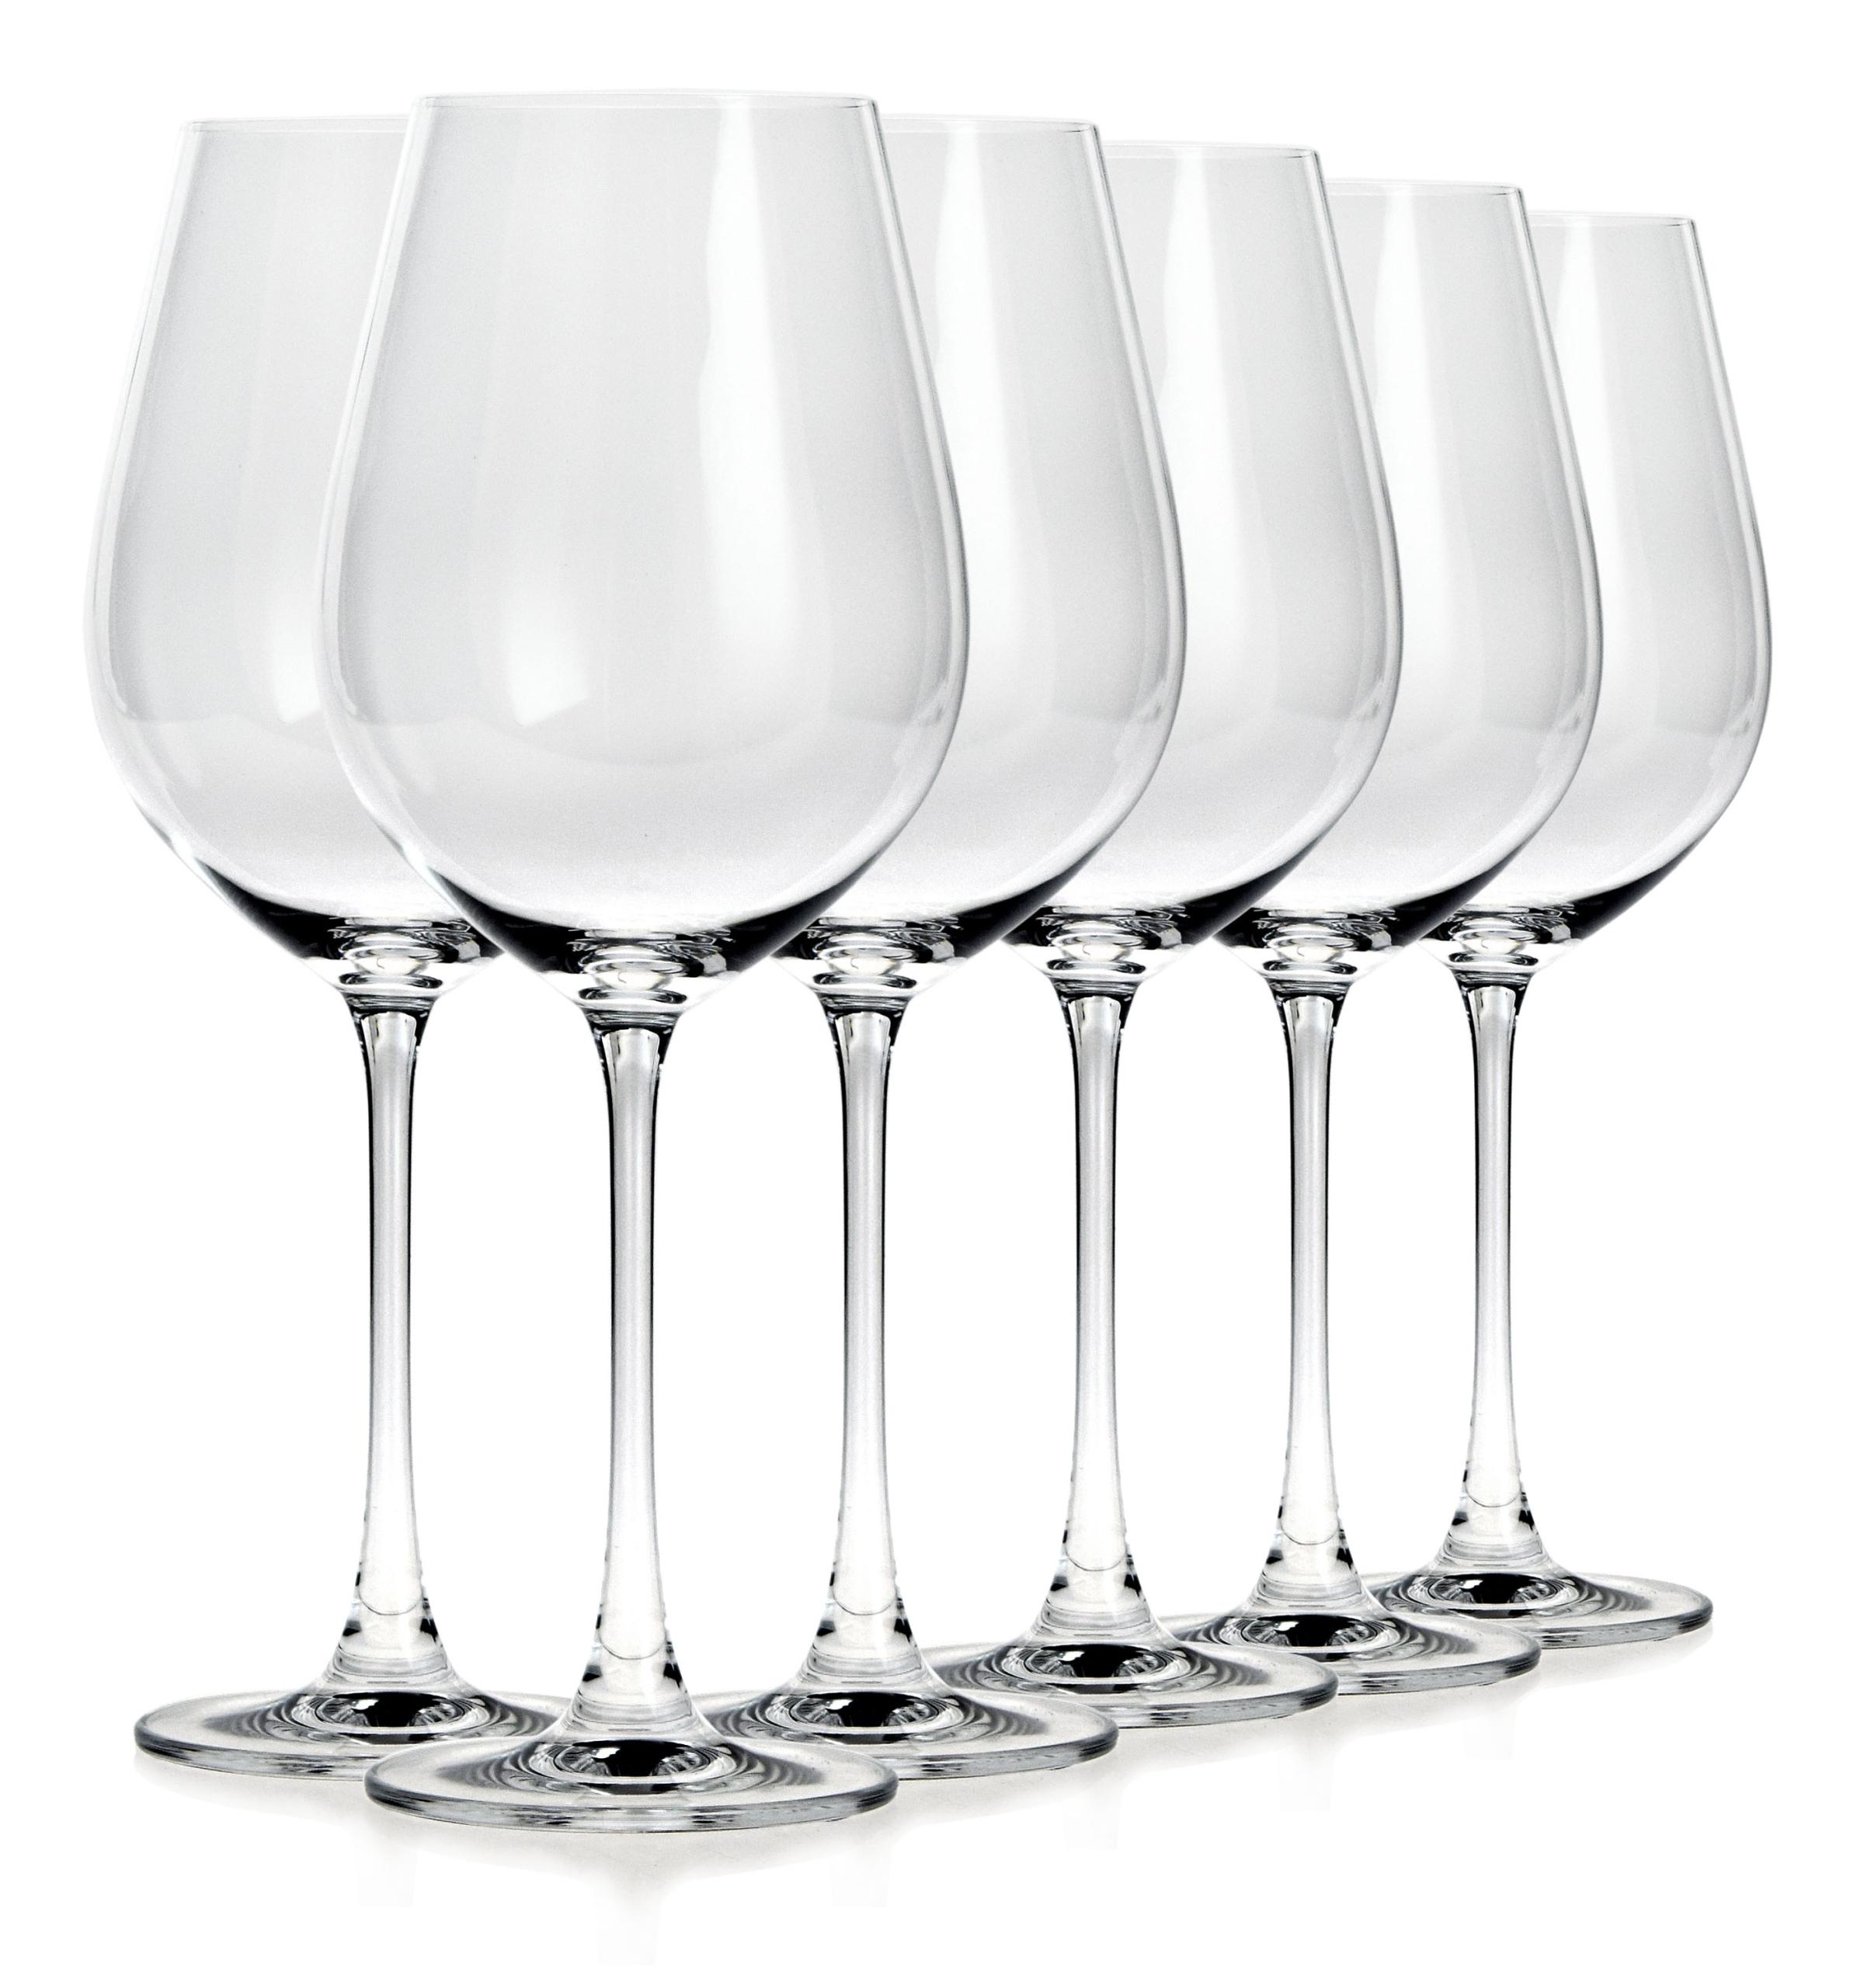 бокалы богемия для красного вина